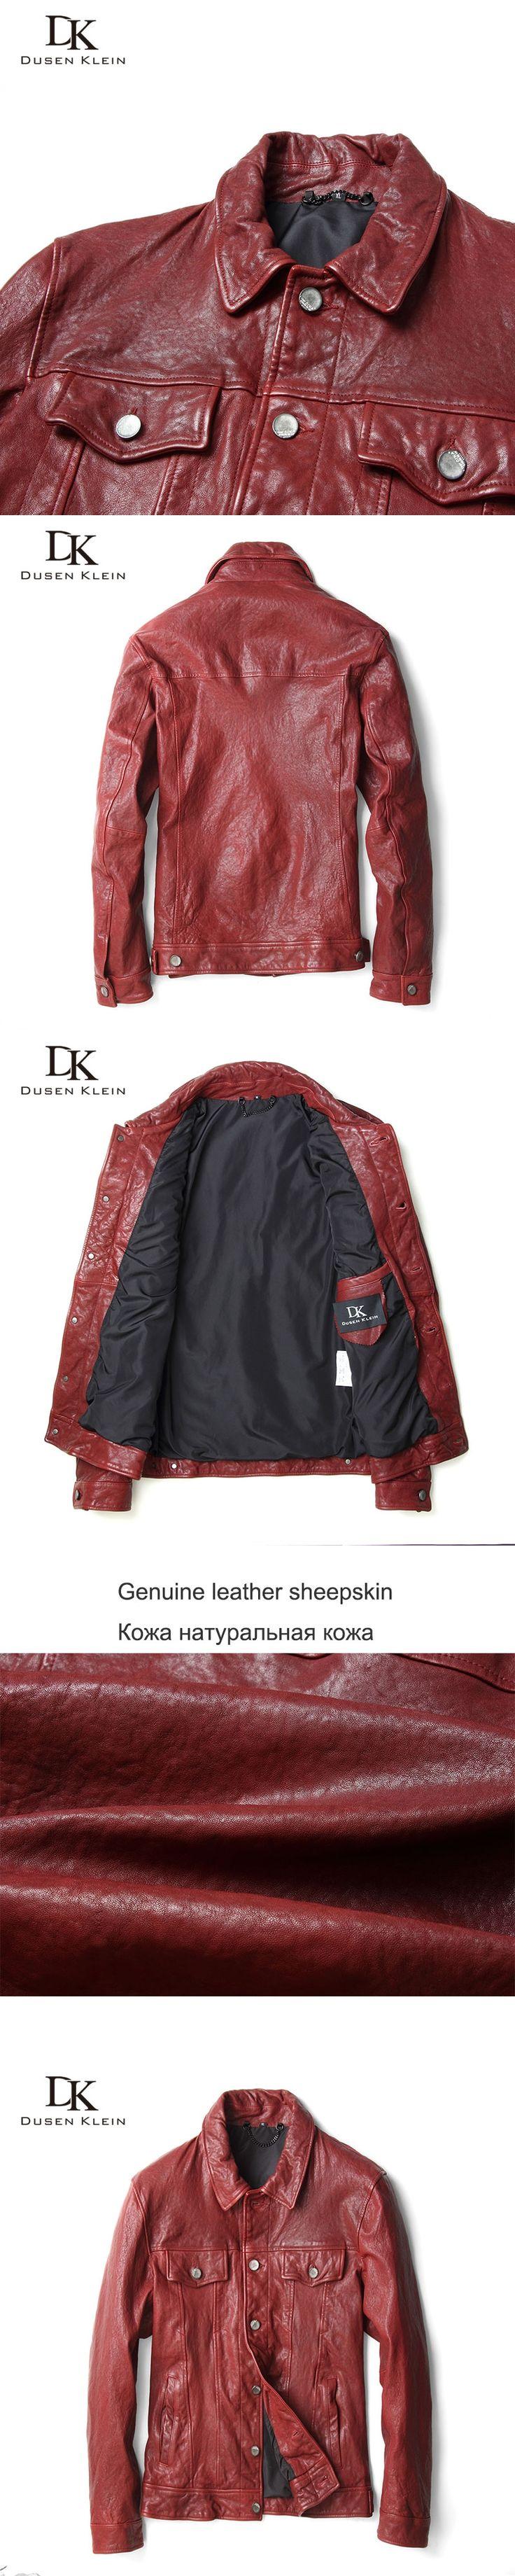 Male leather jacket motorcycle Dusen Klein Red leather jackets real sheepskin slim/Business Pocket leather brand coat 71U9196R